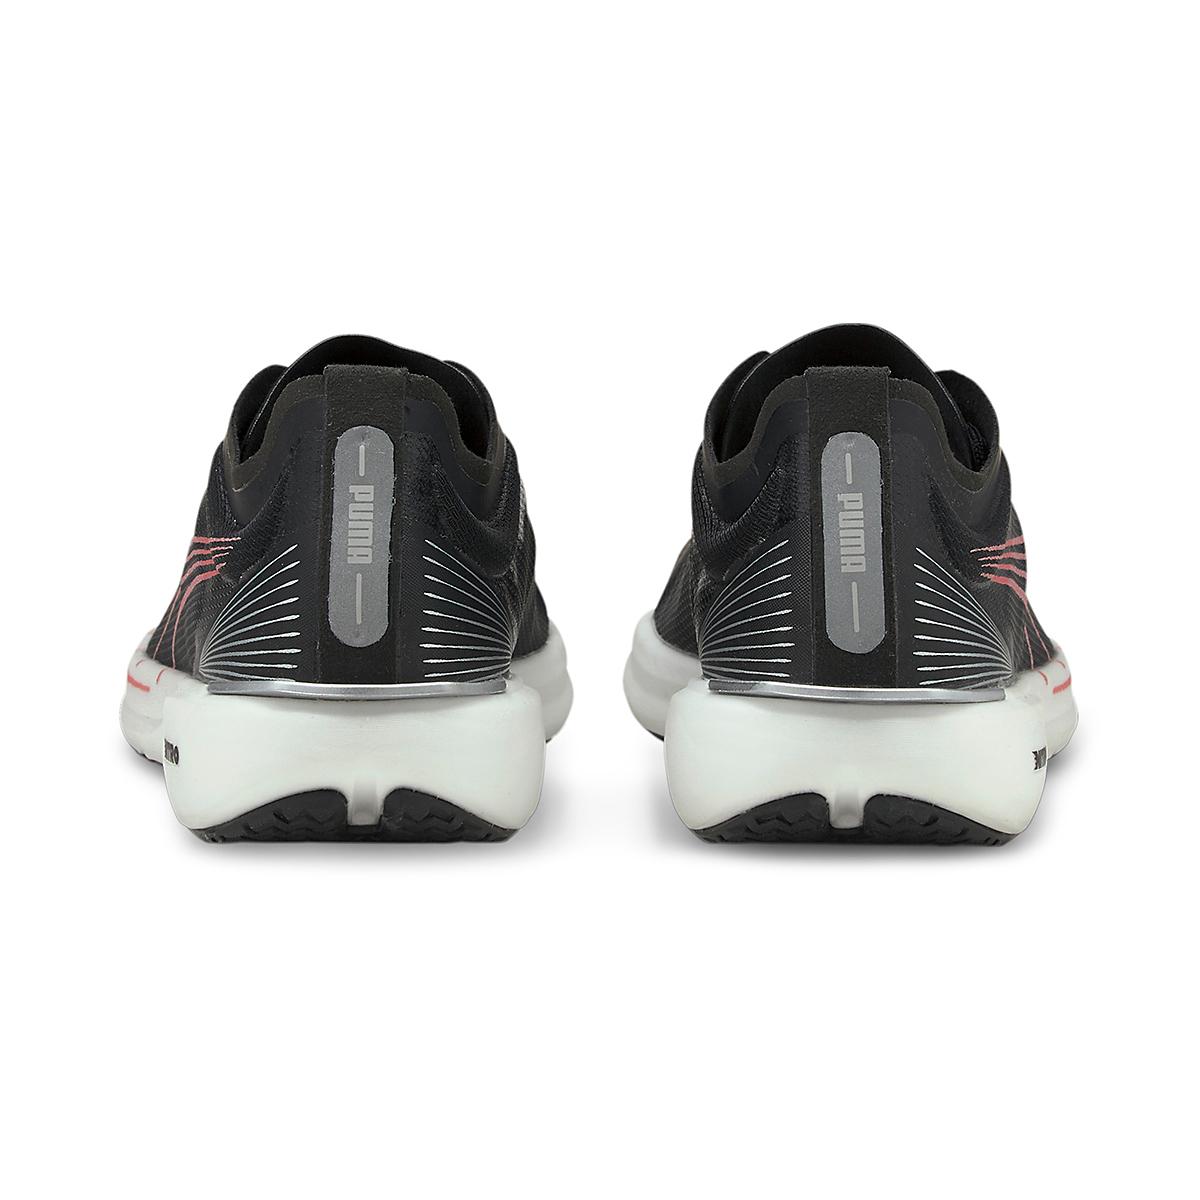 Women's Puma Liberate Nitro Running Shoe - Color: Puma Black - Size: 5.5 - Width: Regular, Puma Black, large, image 4